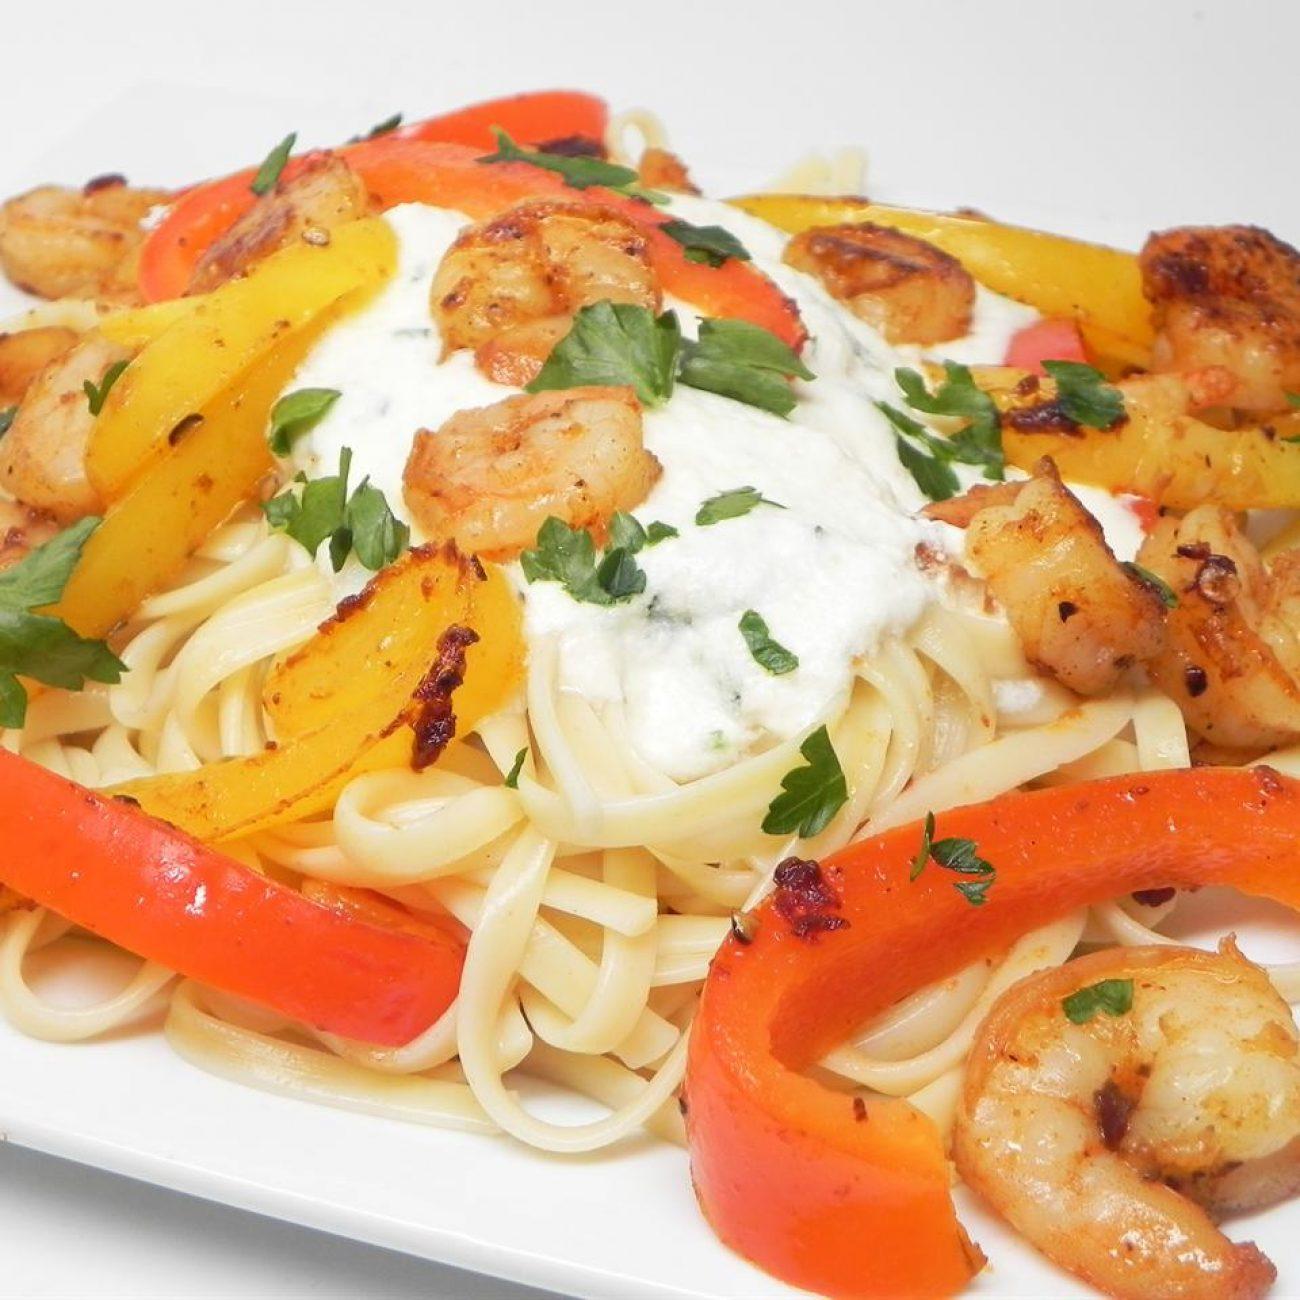 CraZee's Creamy Seafood and Pasta Recipe